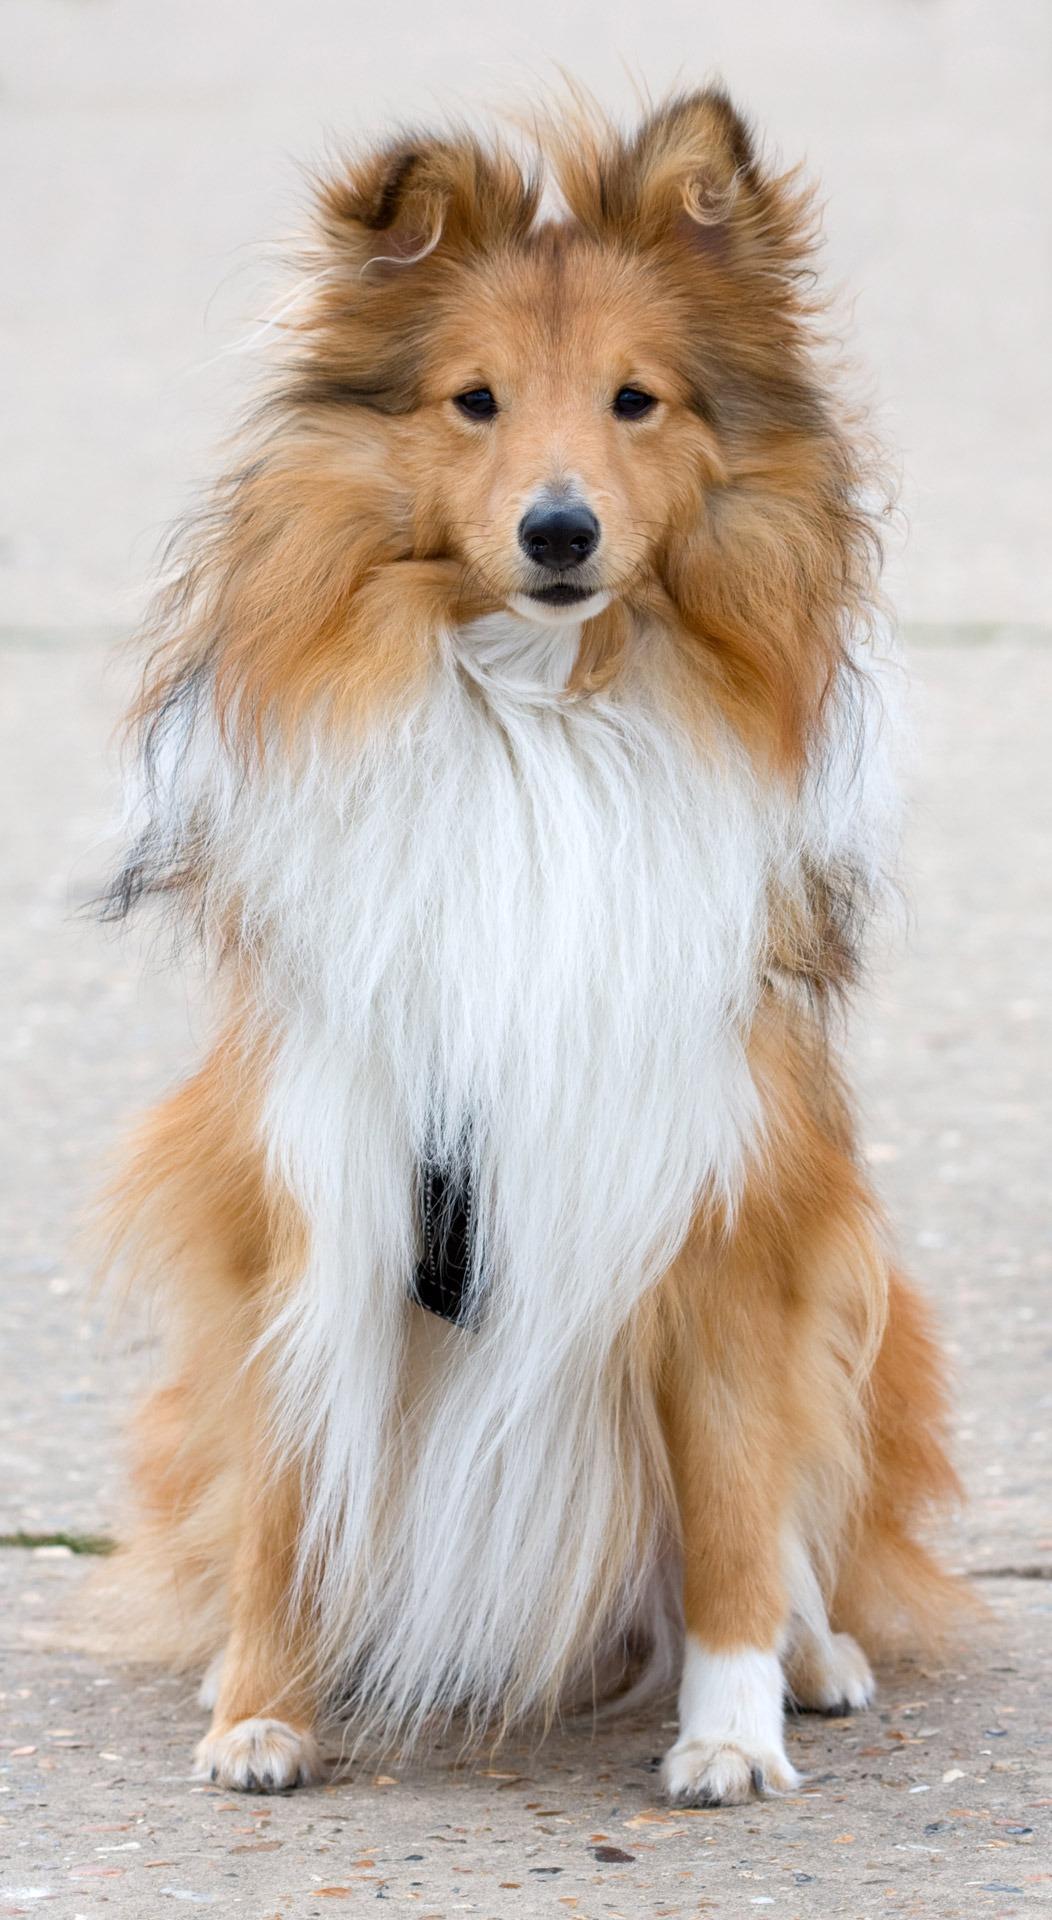 Simple Icelandic Sheepdog Canine Adorable Dog - dog-animal-cute-canine-photo-collie-pet-portrait-macro-sitting-mammal-close-up-vertebrate-details-beautiful-image-pretty-dog-breed-breed-pomeranian-sheltie-shetland-sheepdog-dog-like-mammal-carnivoran-dog-breed-group-icelandic-sheepdog-finnish-spitz-rough-collie-german-spitz-mittel-german-spitz-german-spitz-klein-tibetan-spaniel-scotch-collie-1022789  Trends_167114  .jpg